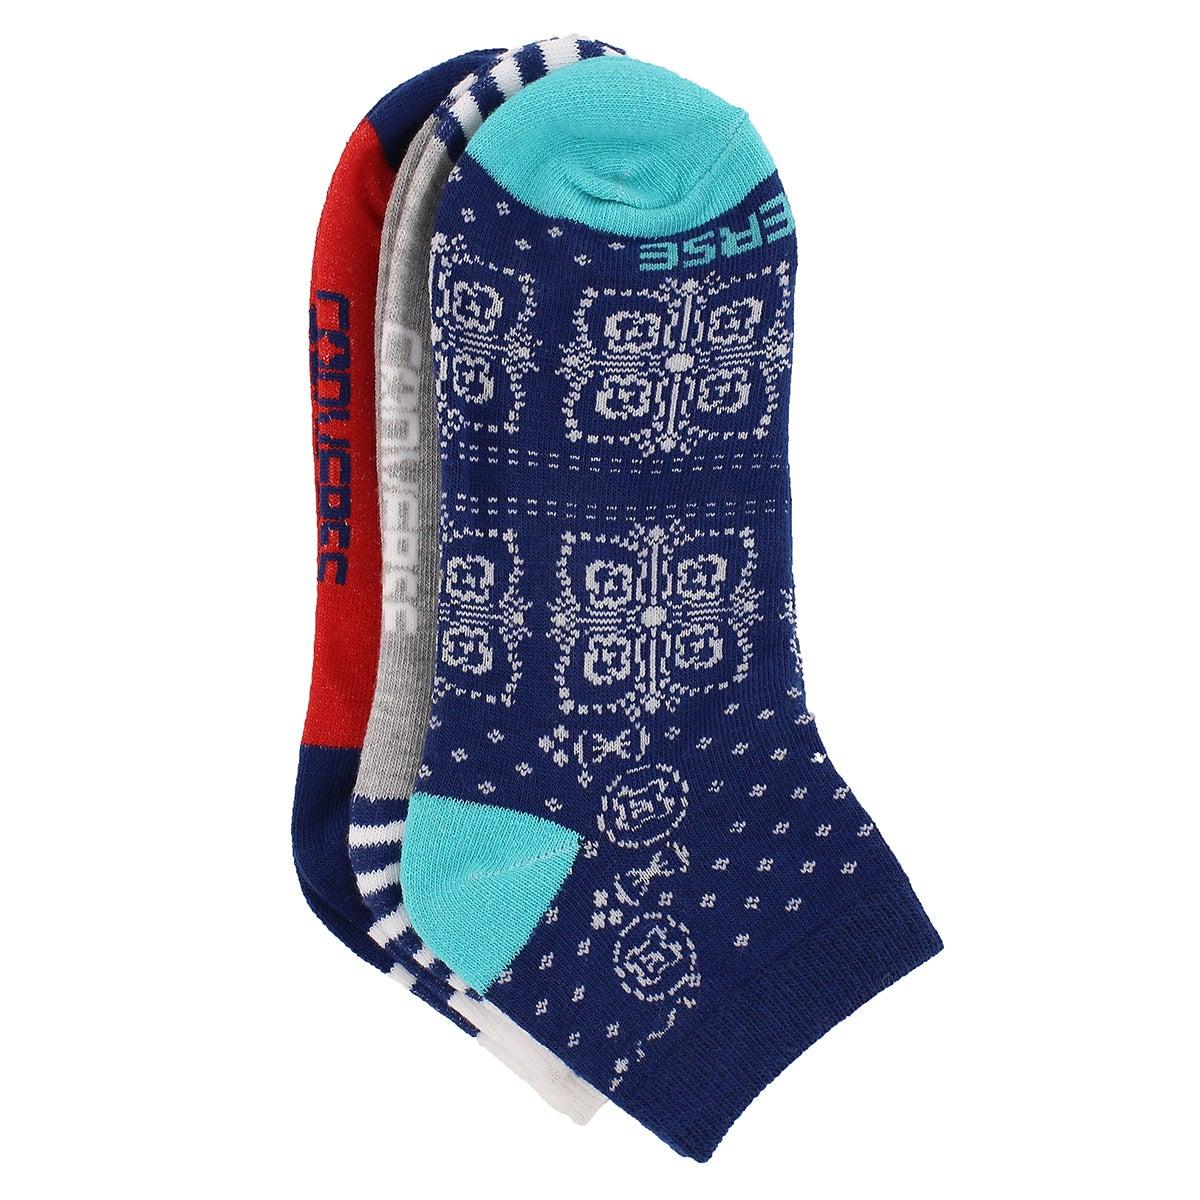 Lds Converse Bandana blu lowcut sock 3pk